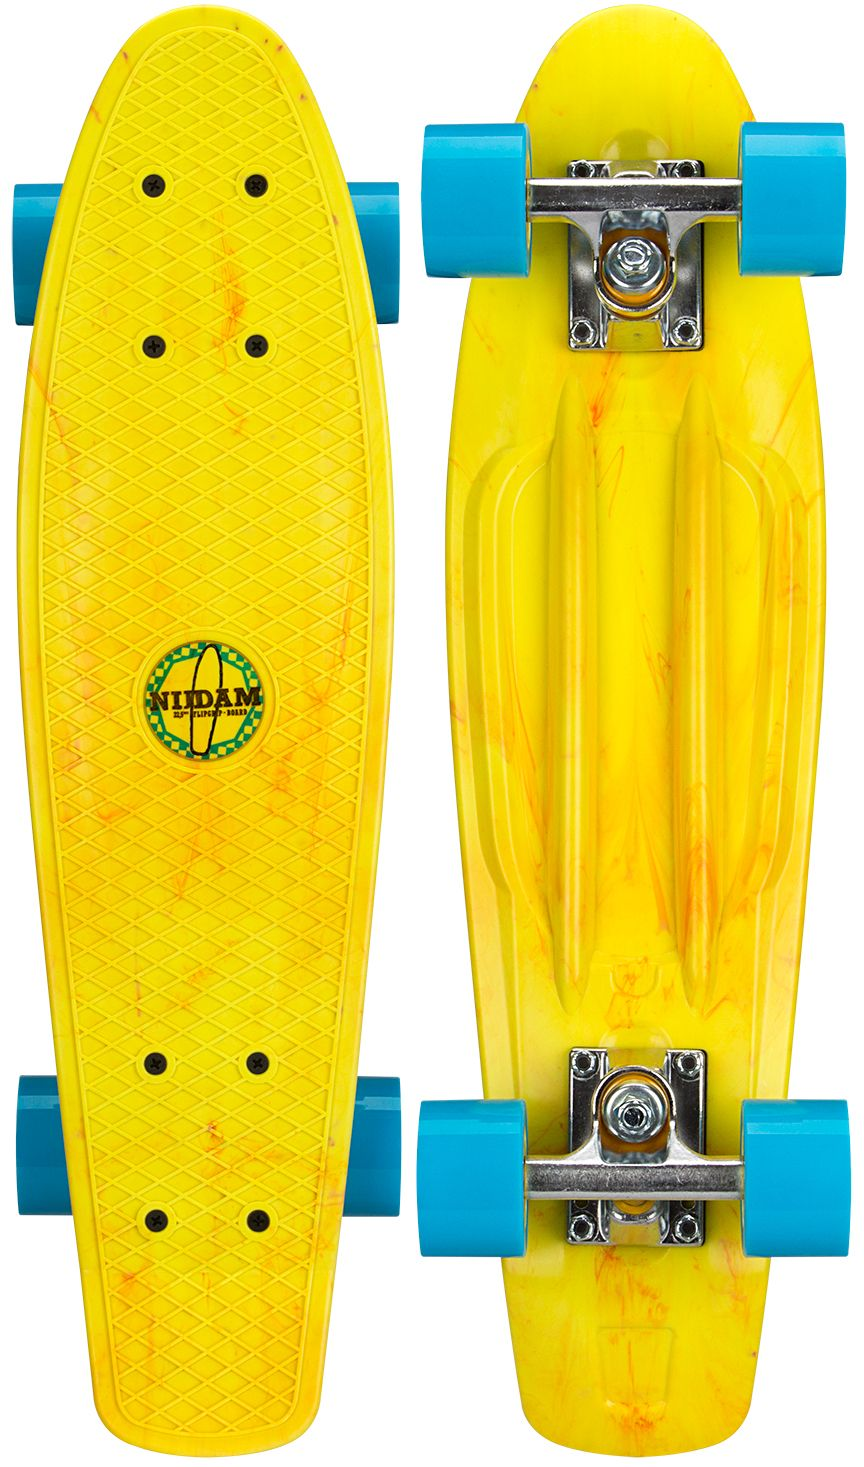 "Kunststof Skateboard 22.5"" • Splash Dye •"